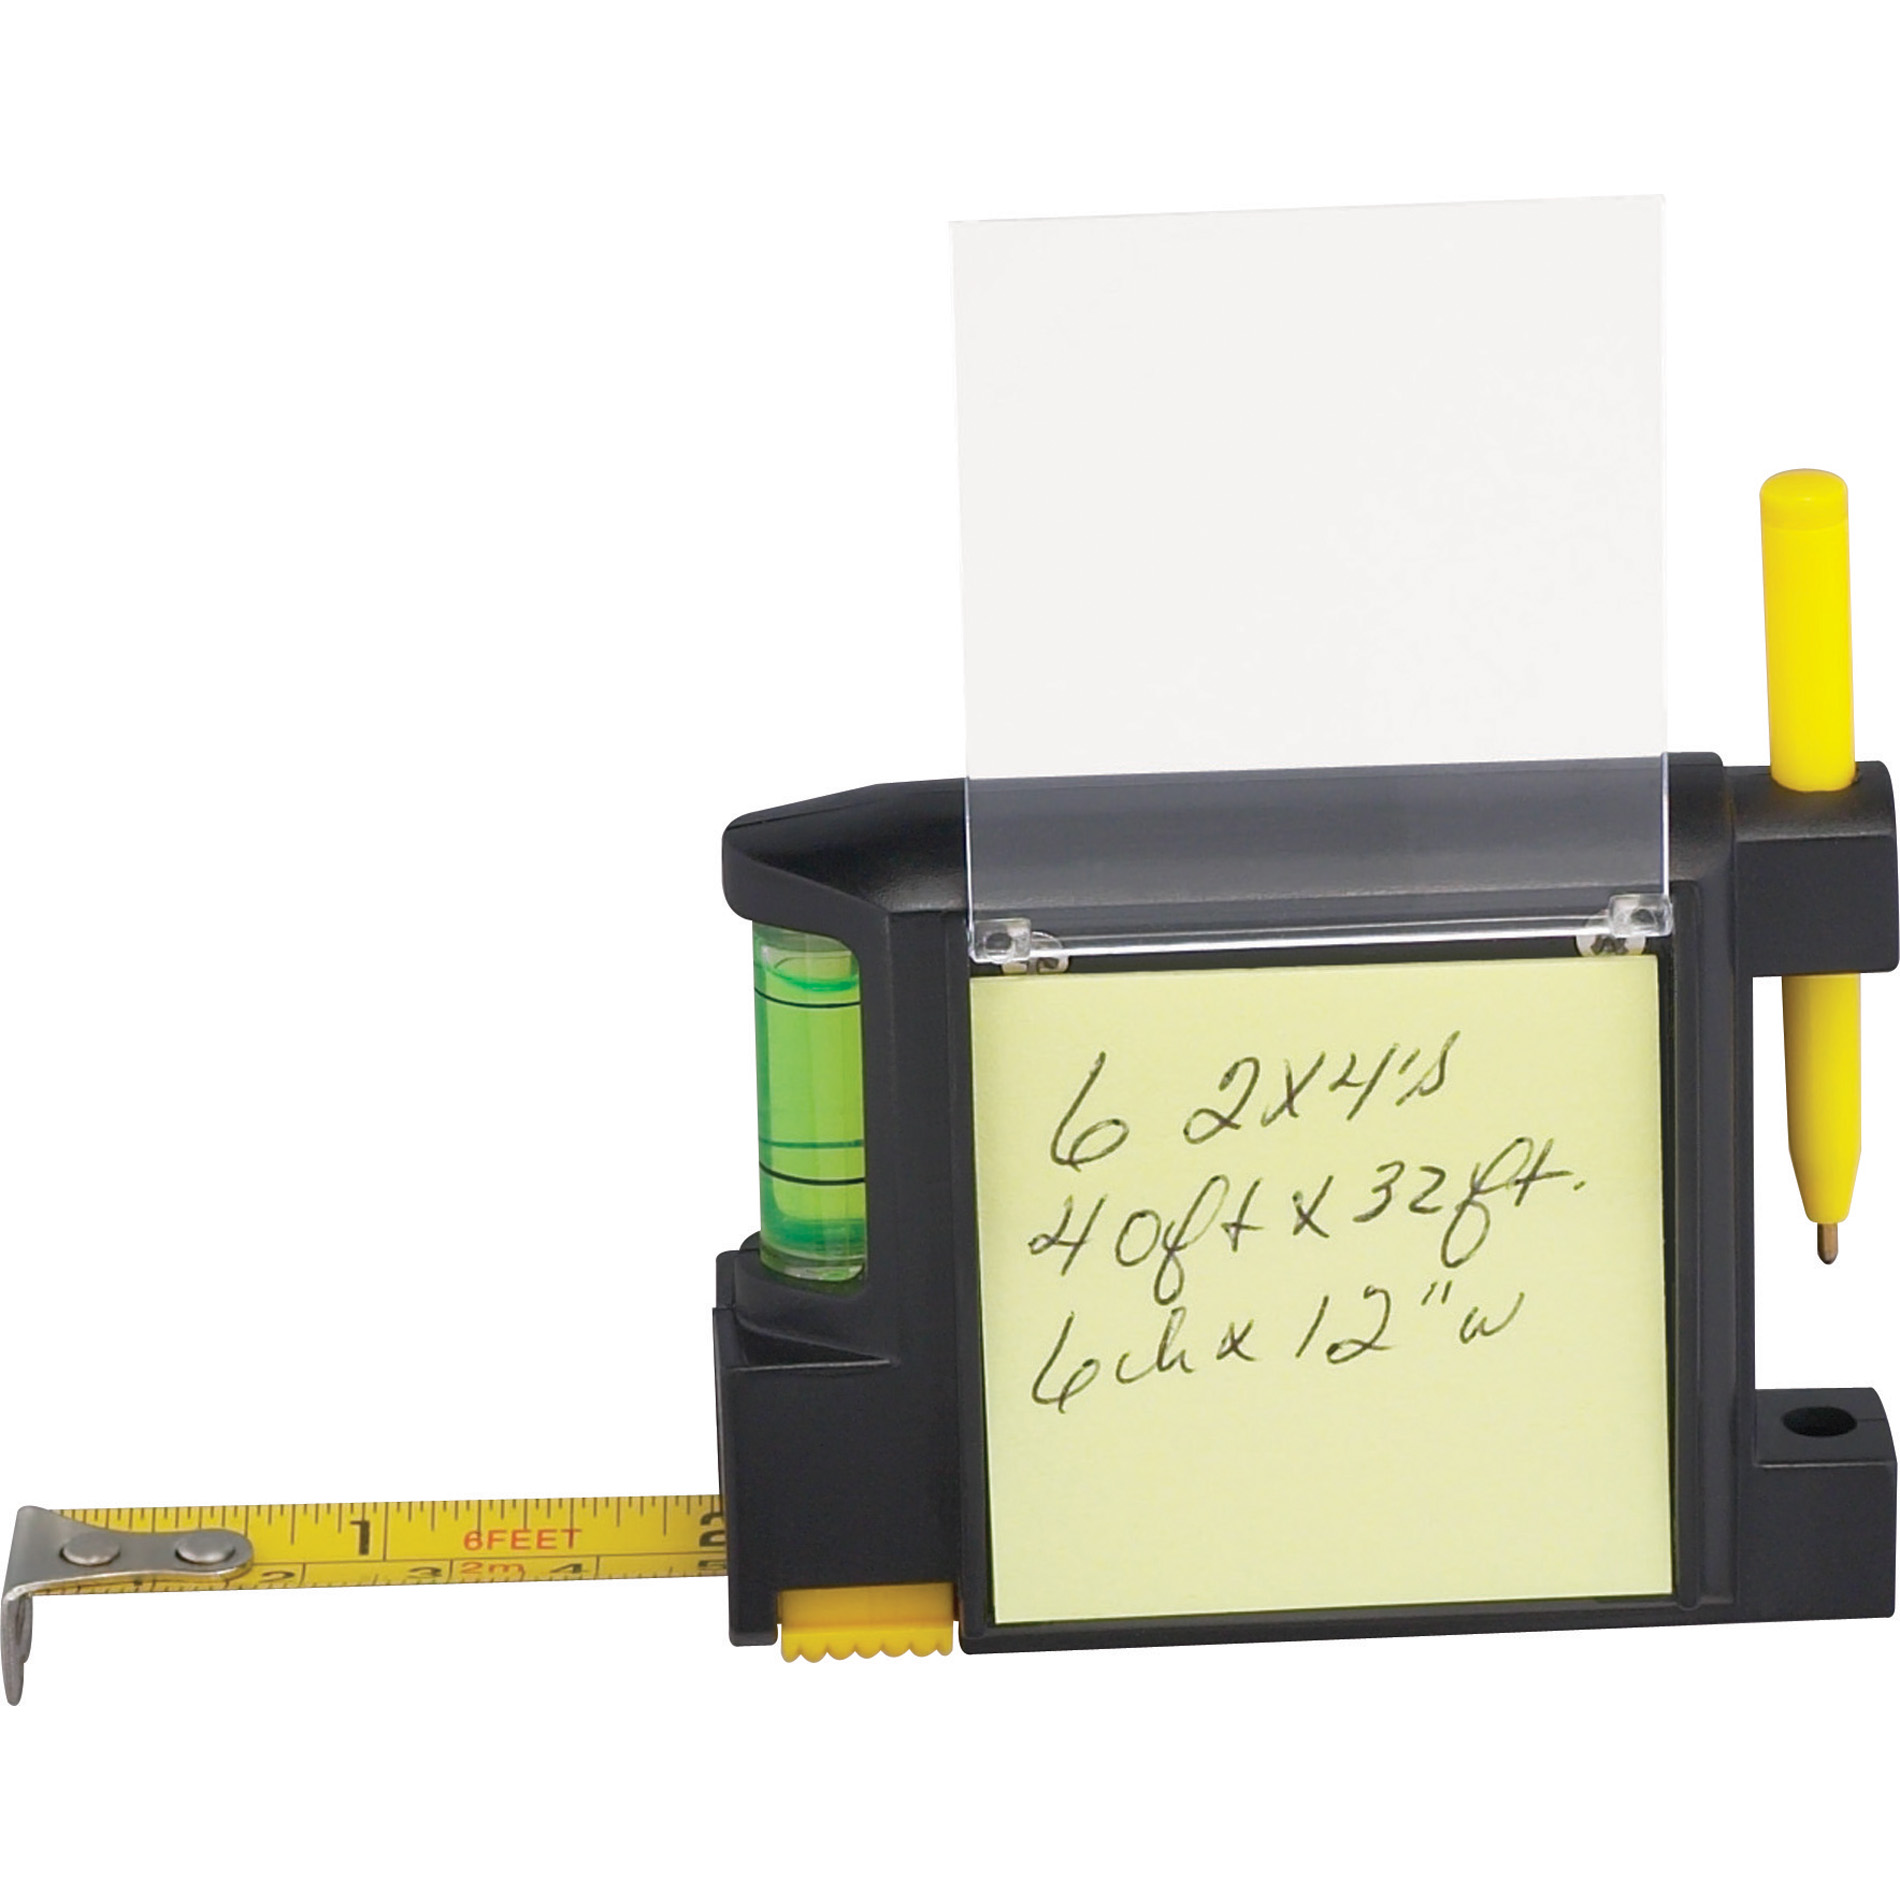 Combo Tape Measure / Level